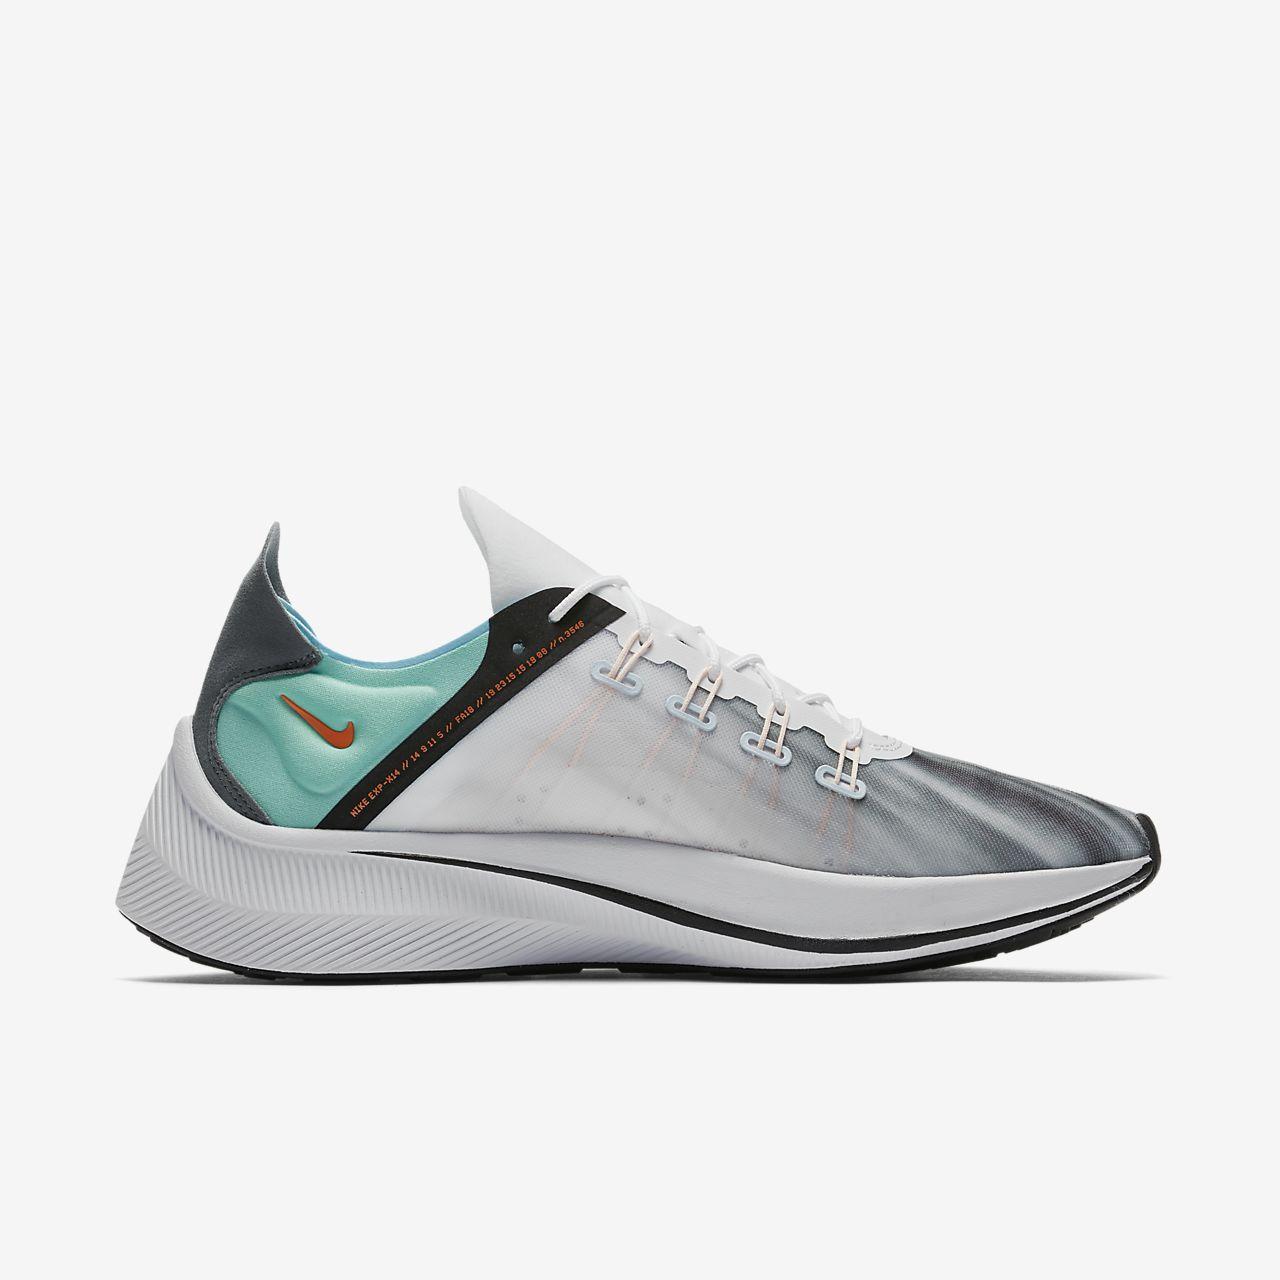 timeless design 3a5ac 96b28 ... Nike EXP-X14 QS Men s Shoe